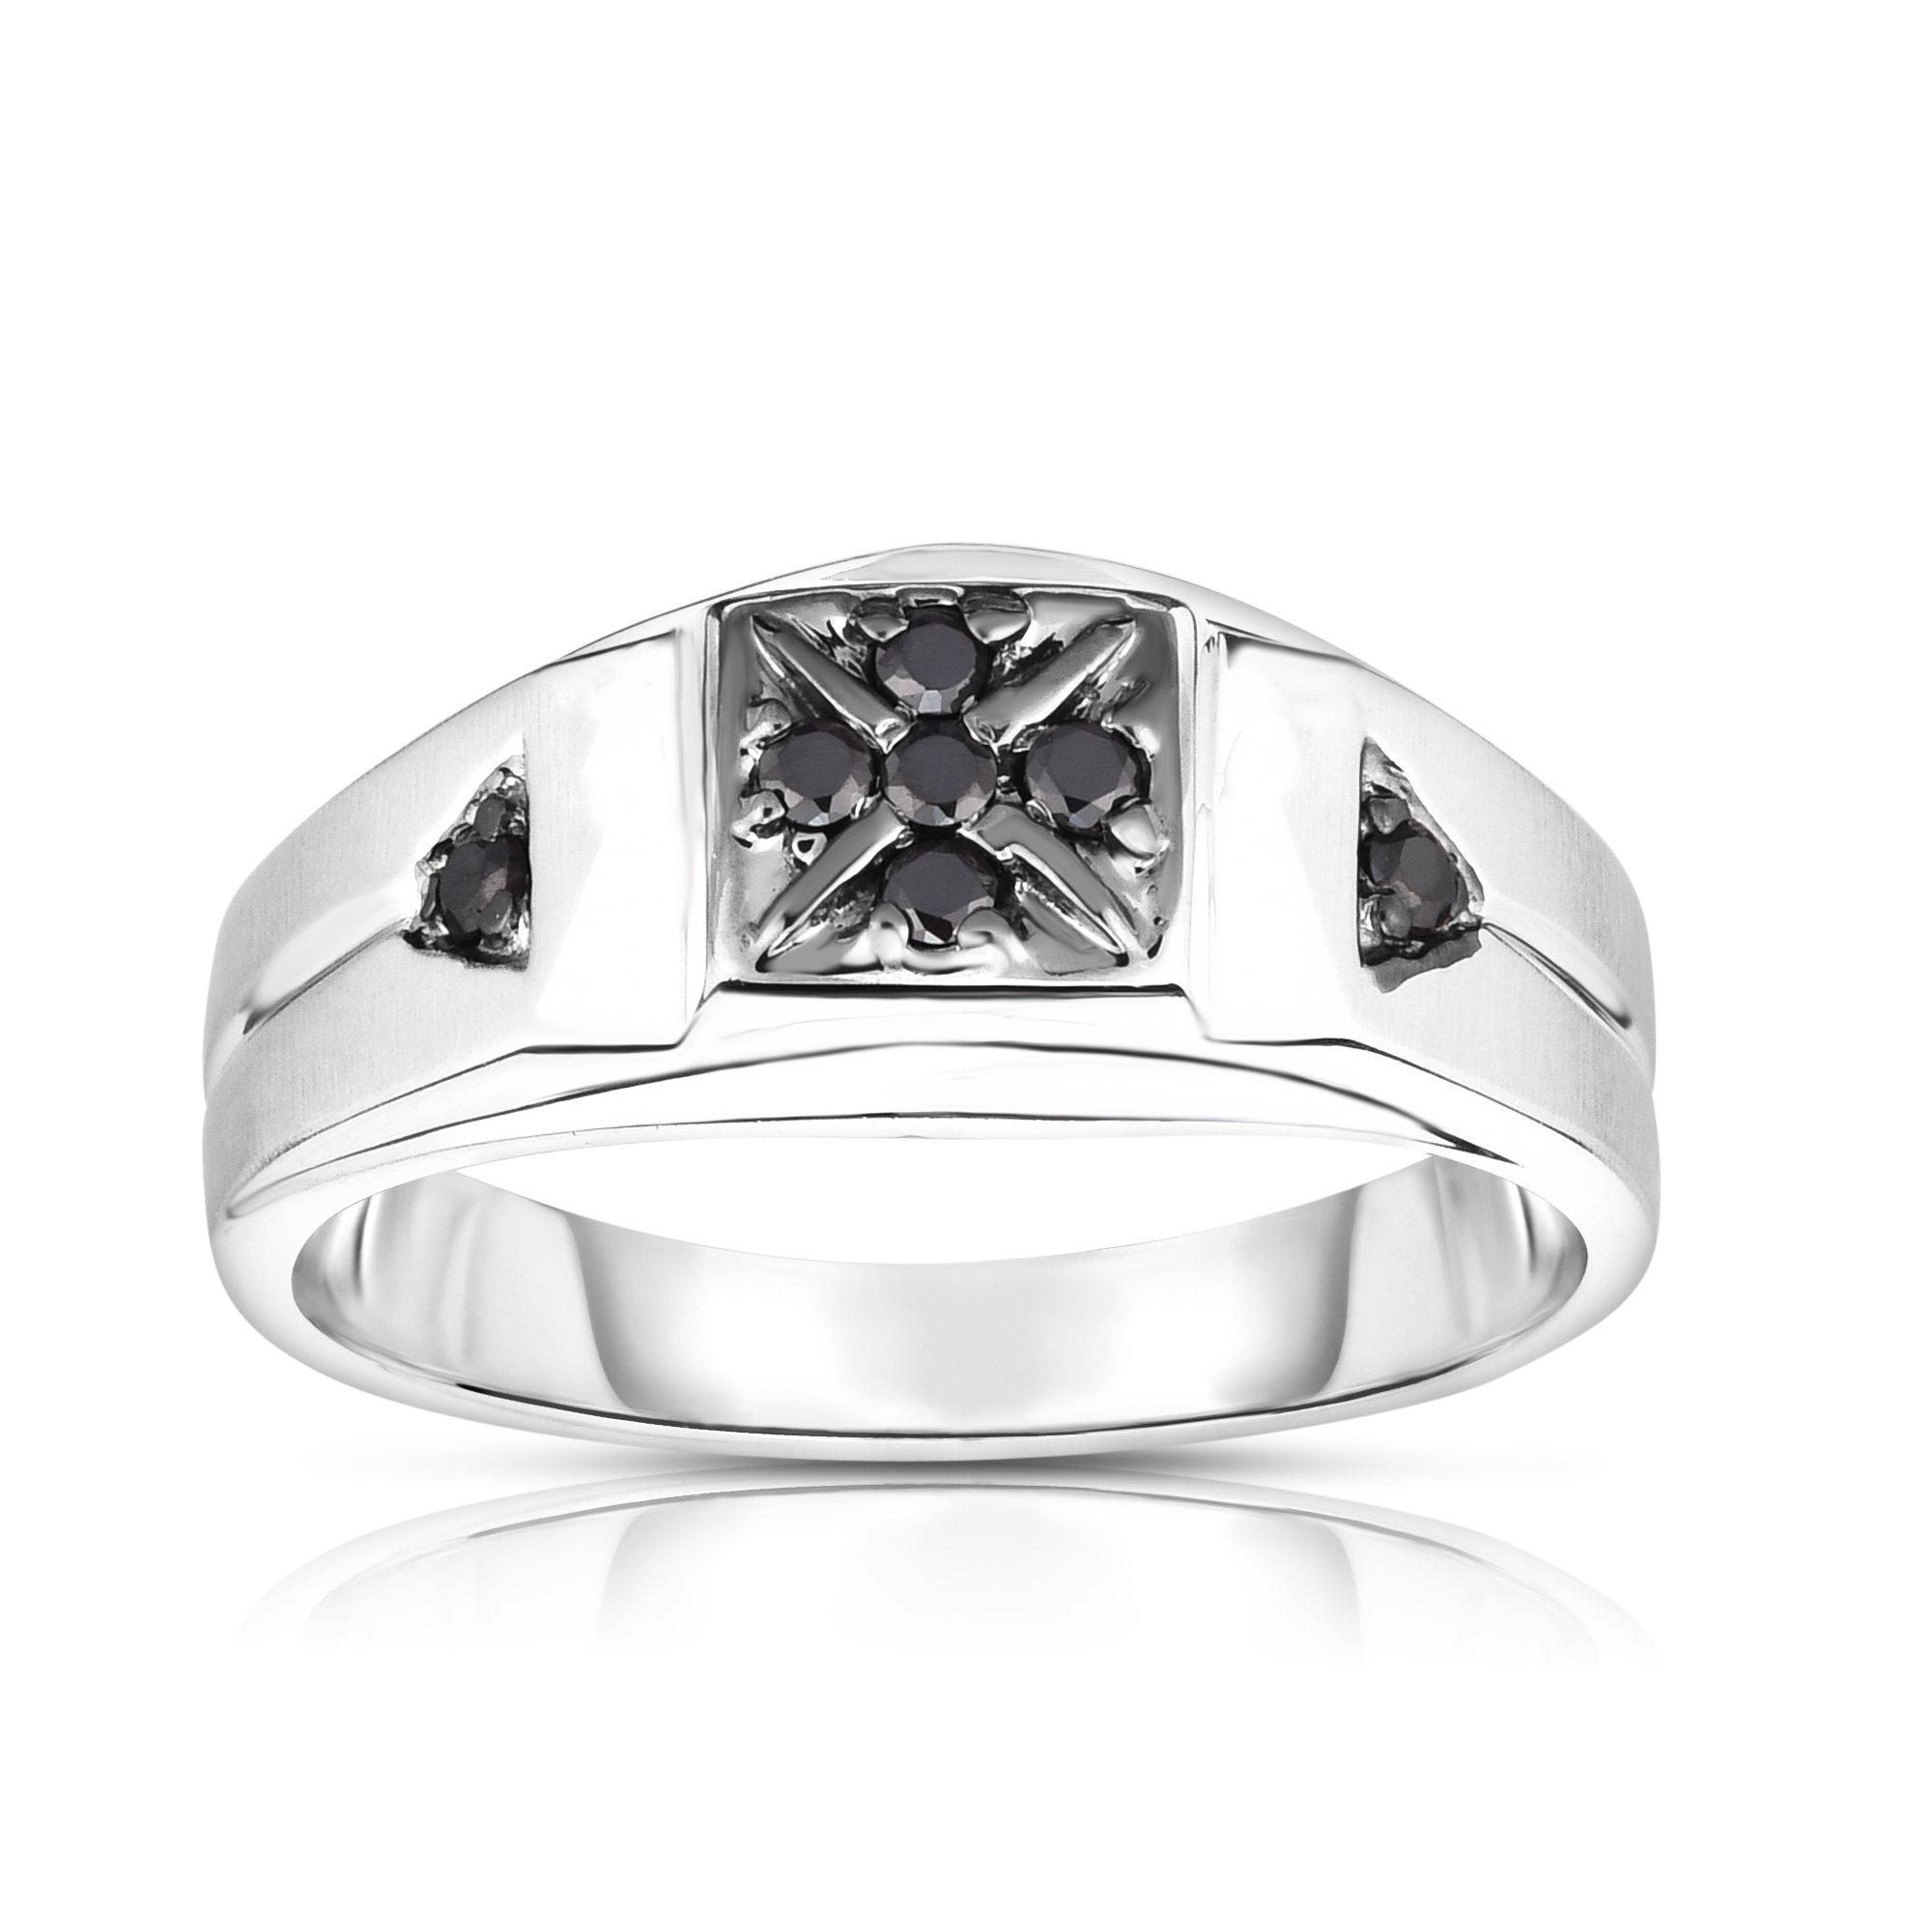 Noray Designs 14K Gold Black Diamond (0.14 Ct, I1-I2 Clarity, Black Color) Men's 7-Stone Ring